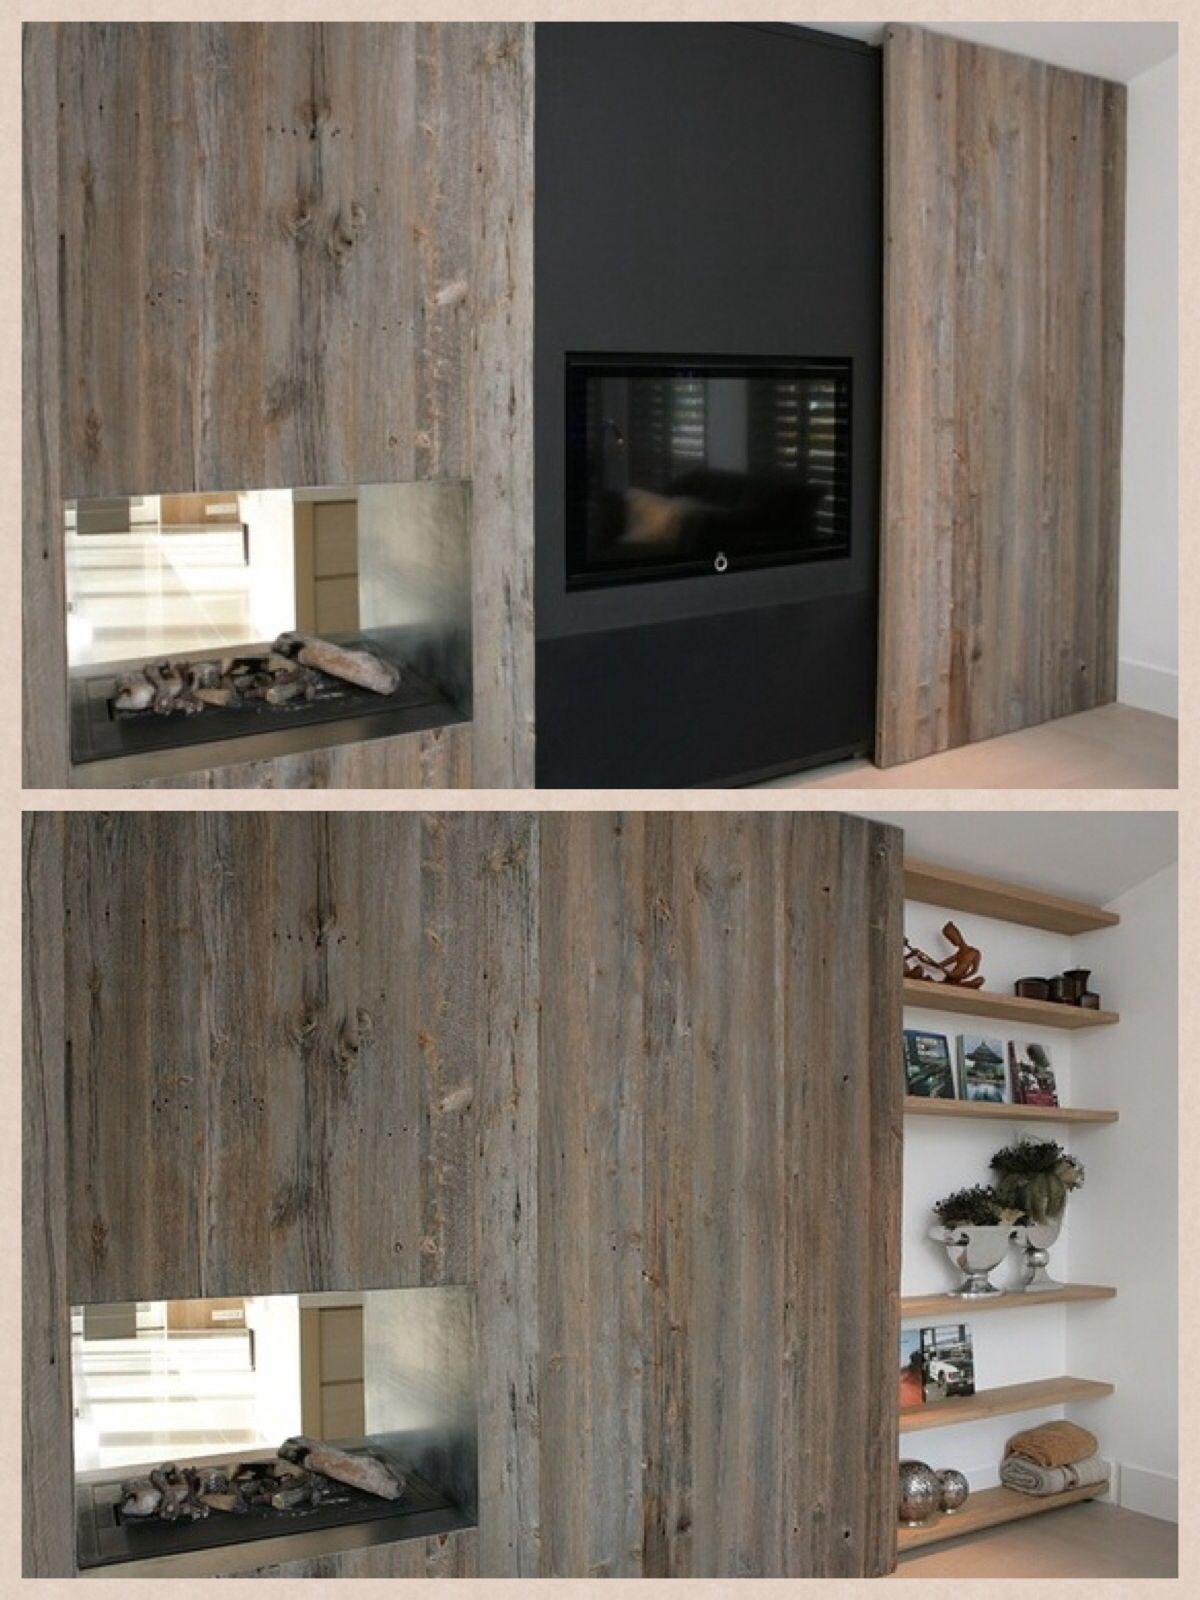 Schuifwand   Woonkamer   Pinterest   Double sided fireplace, DIY ...